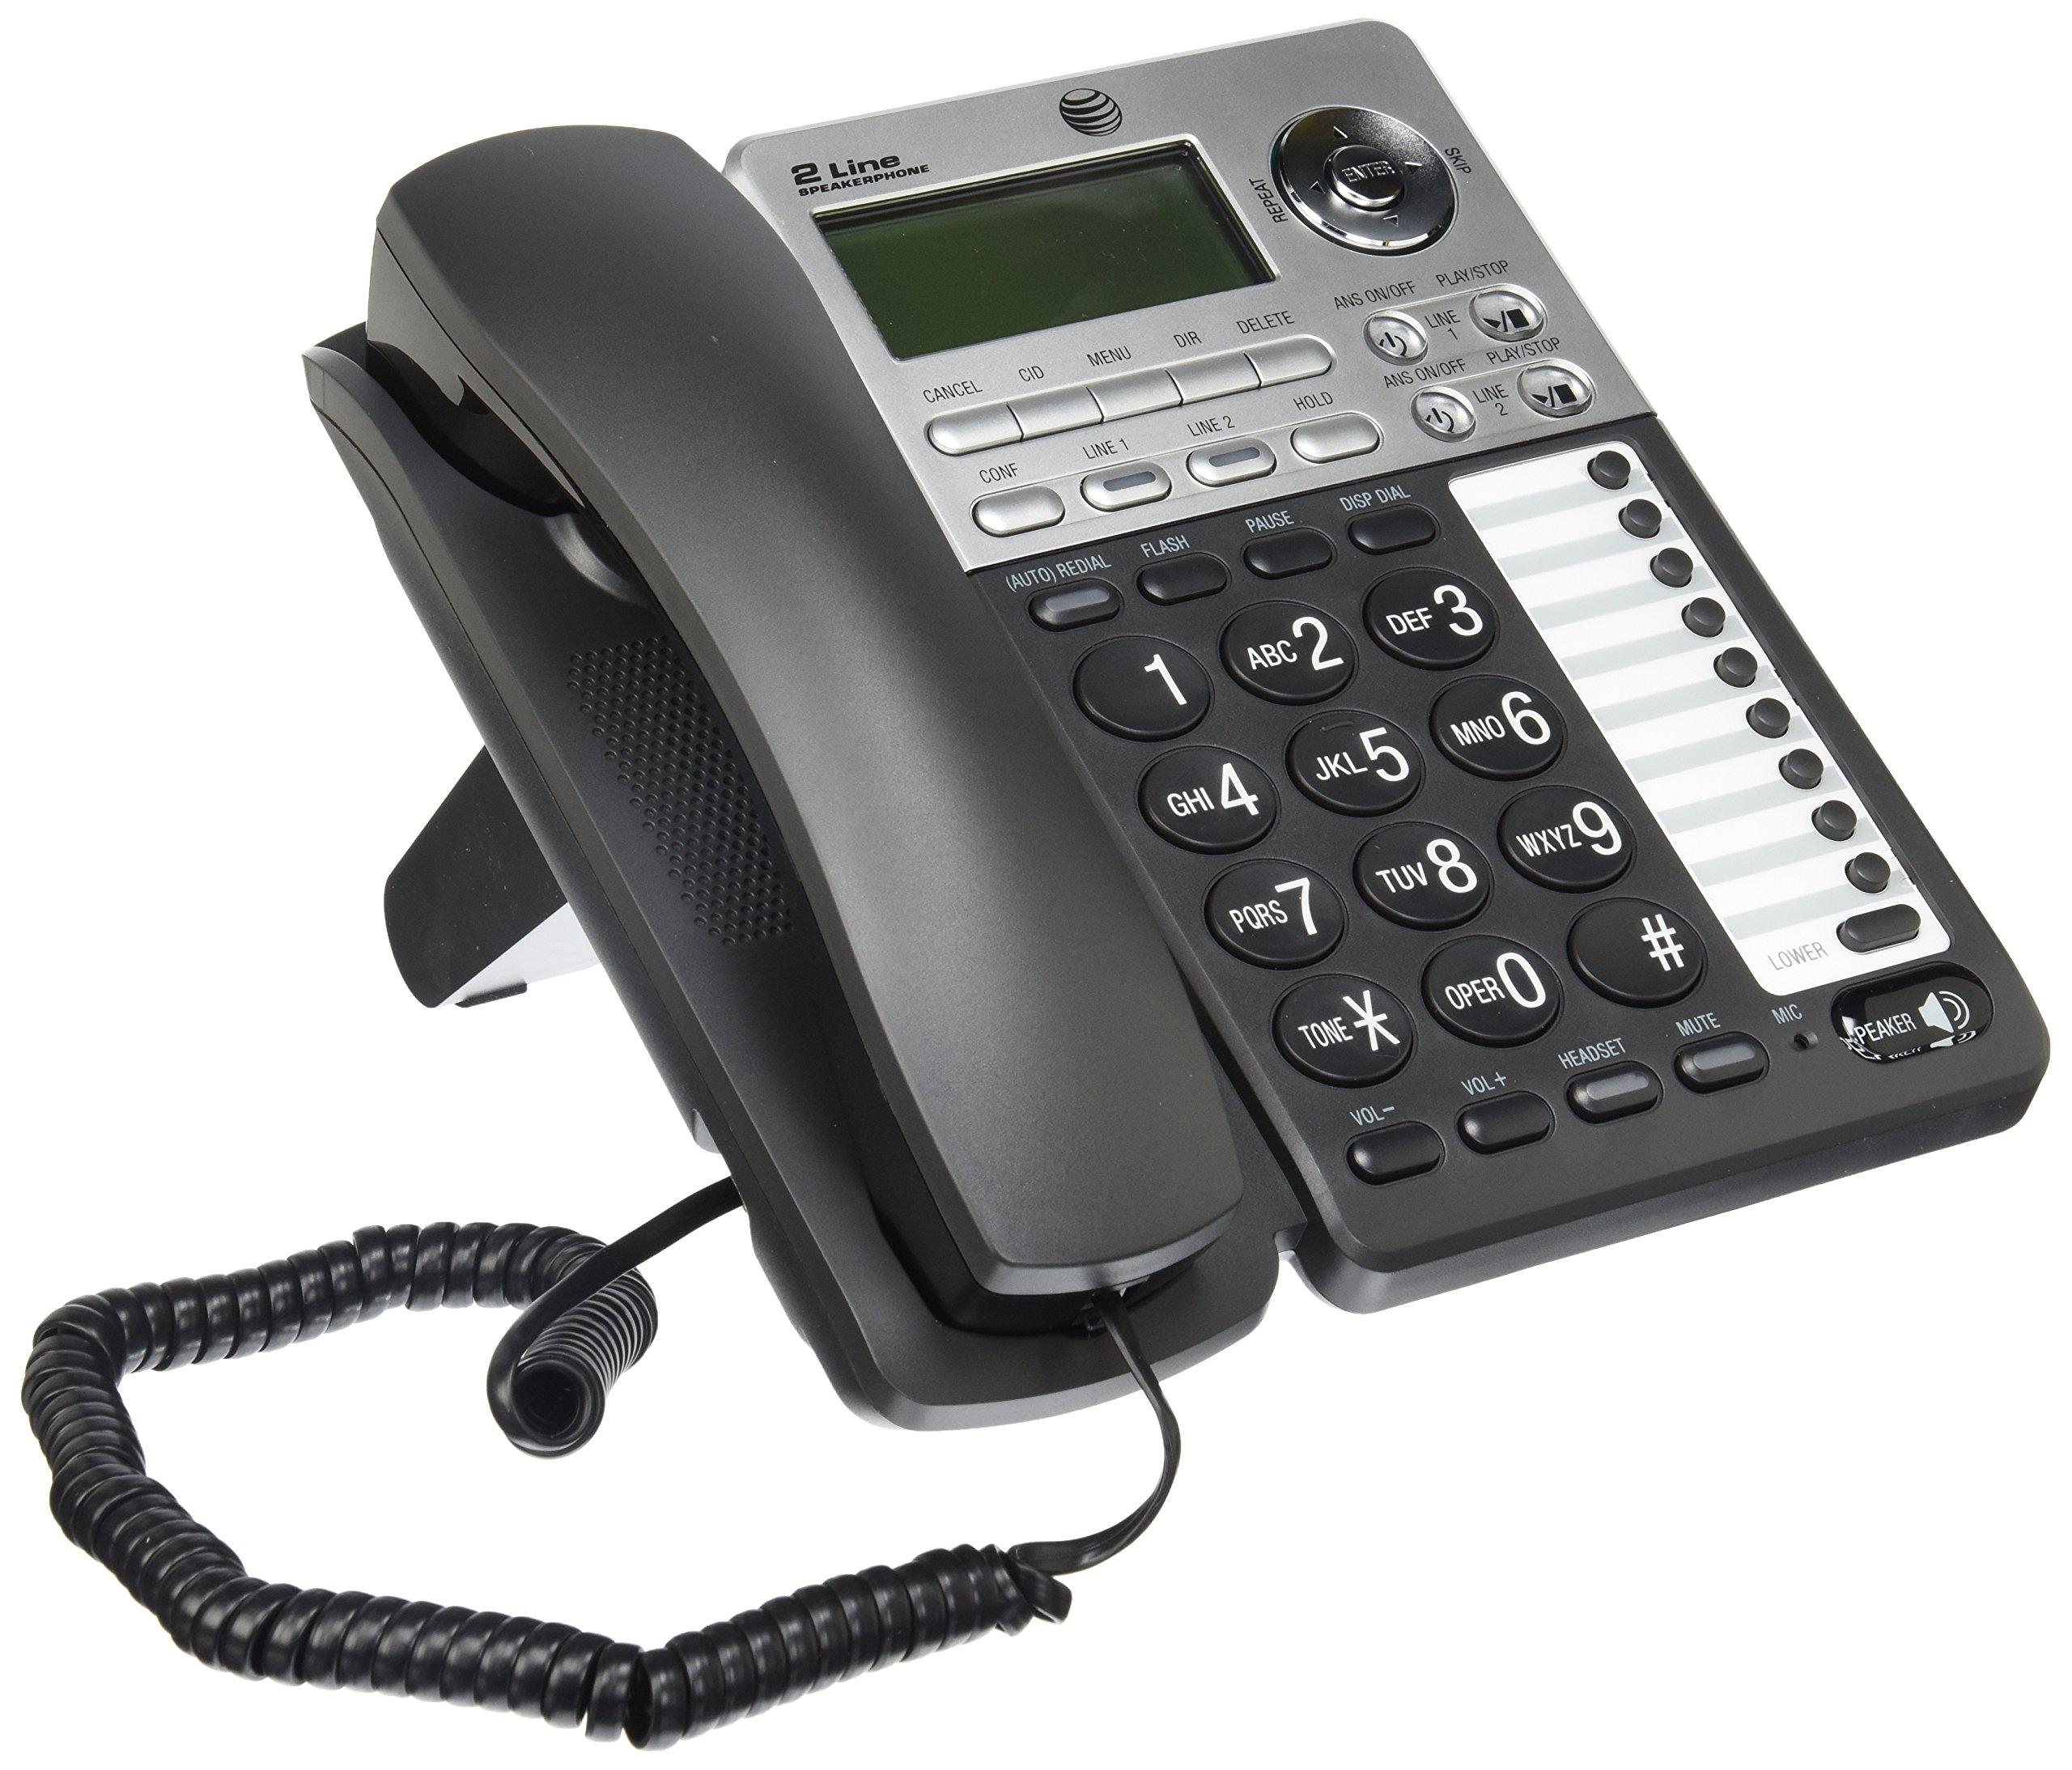 AT ML17939 Telephone Digital Answering